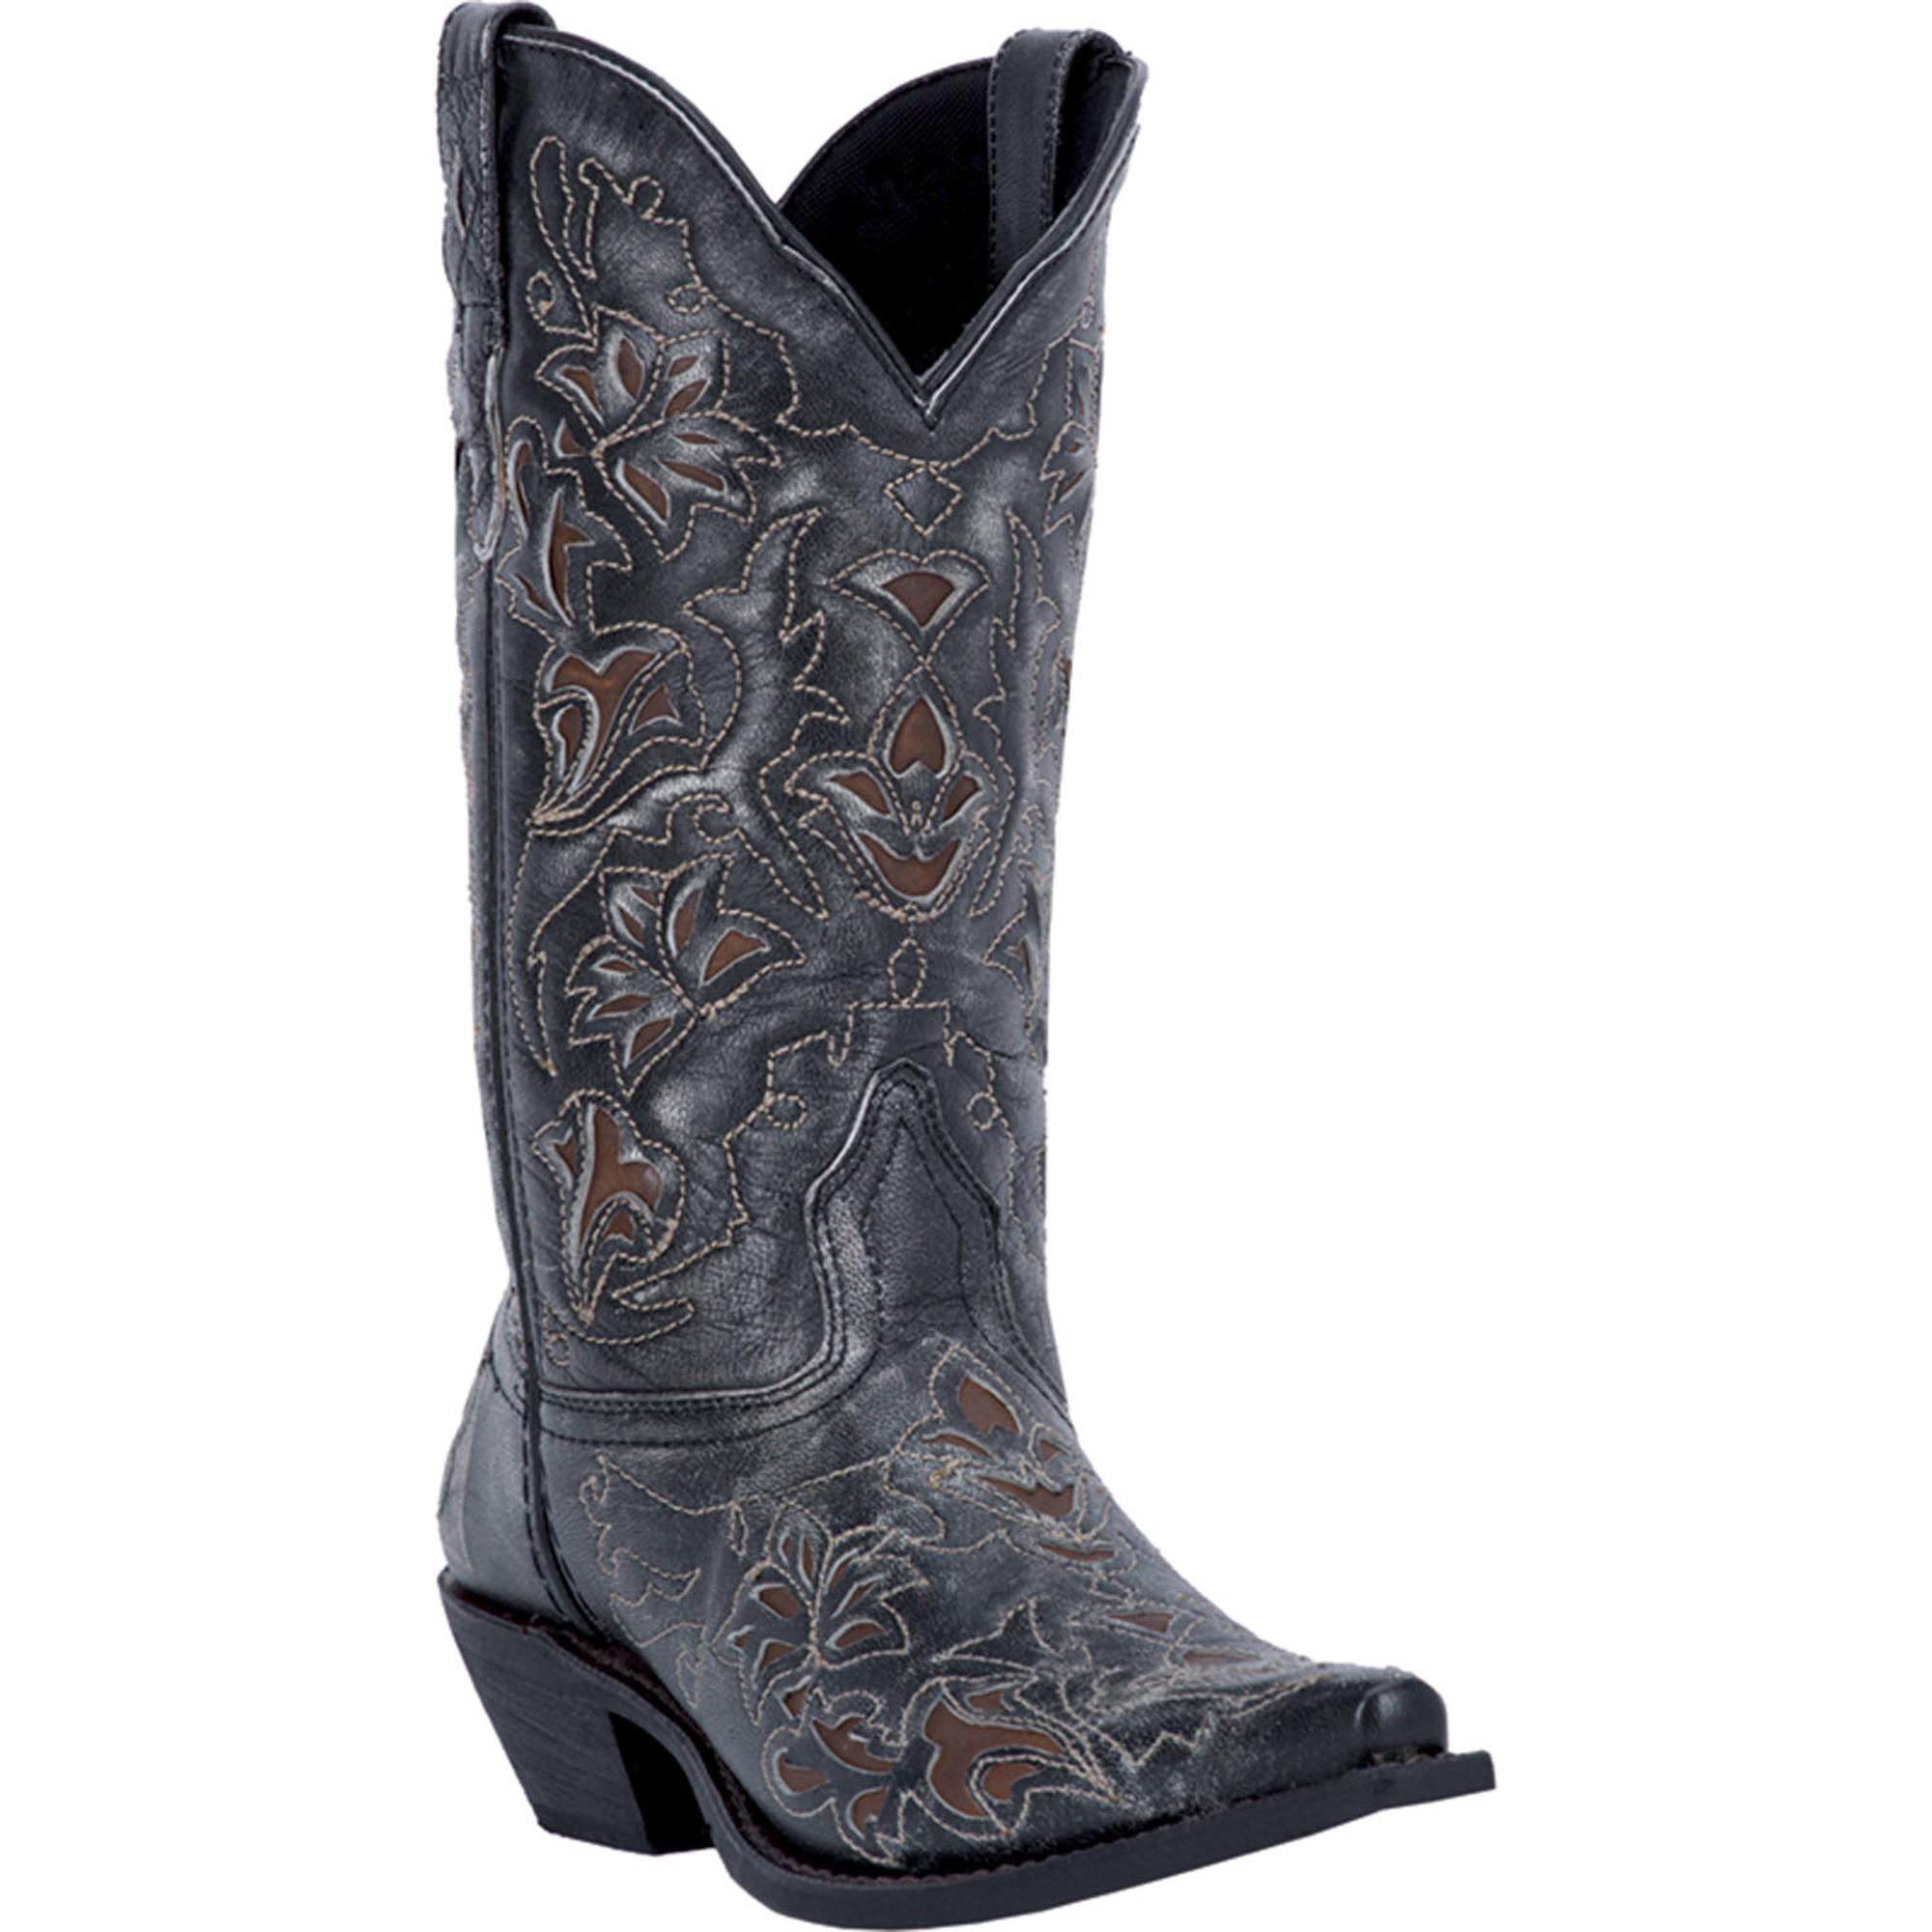 Amazing Short Black Cowboy Boots For Women